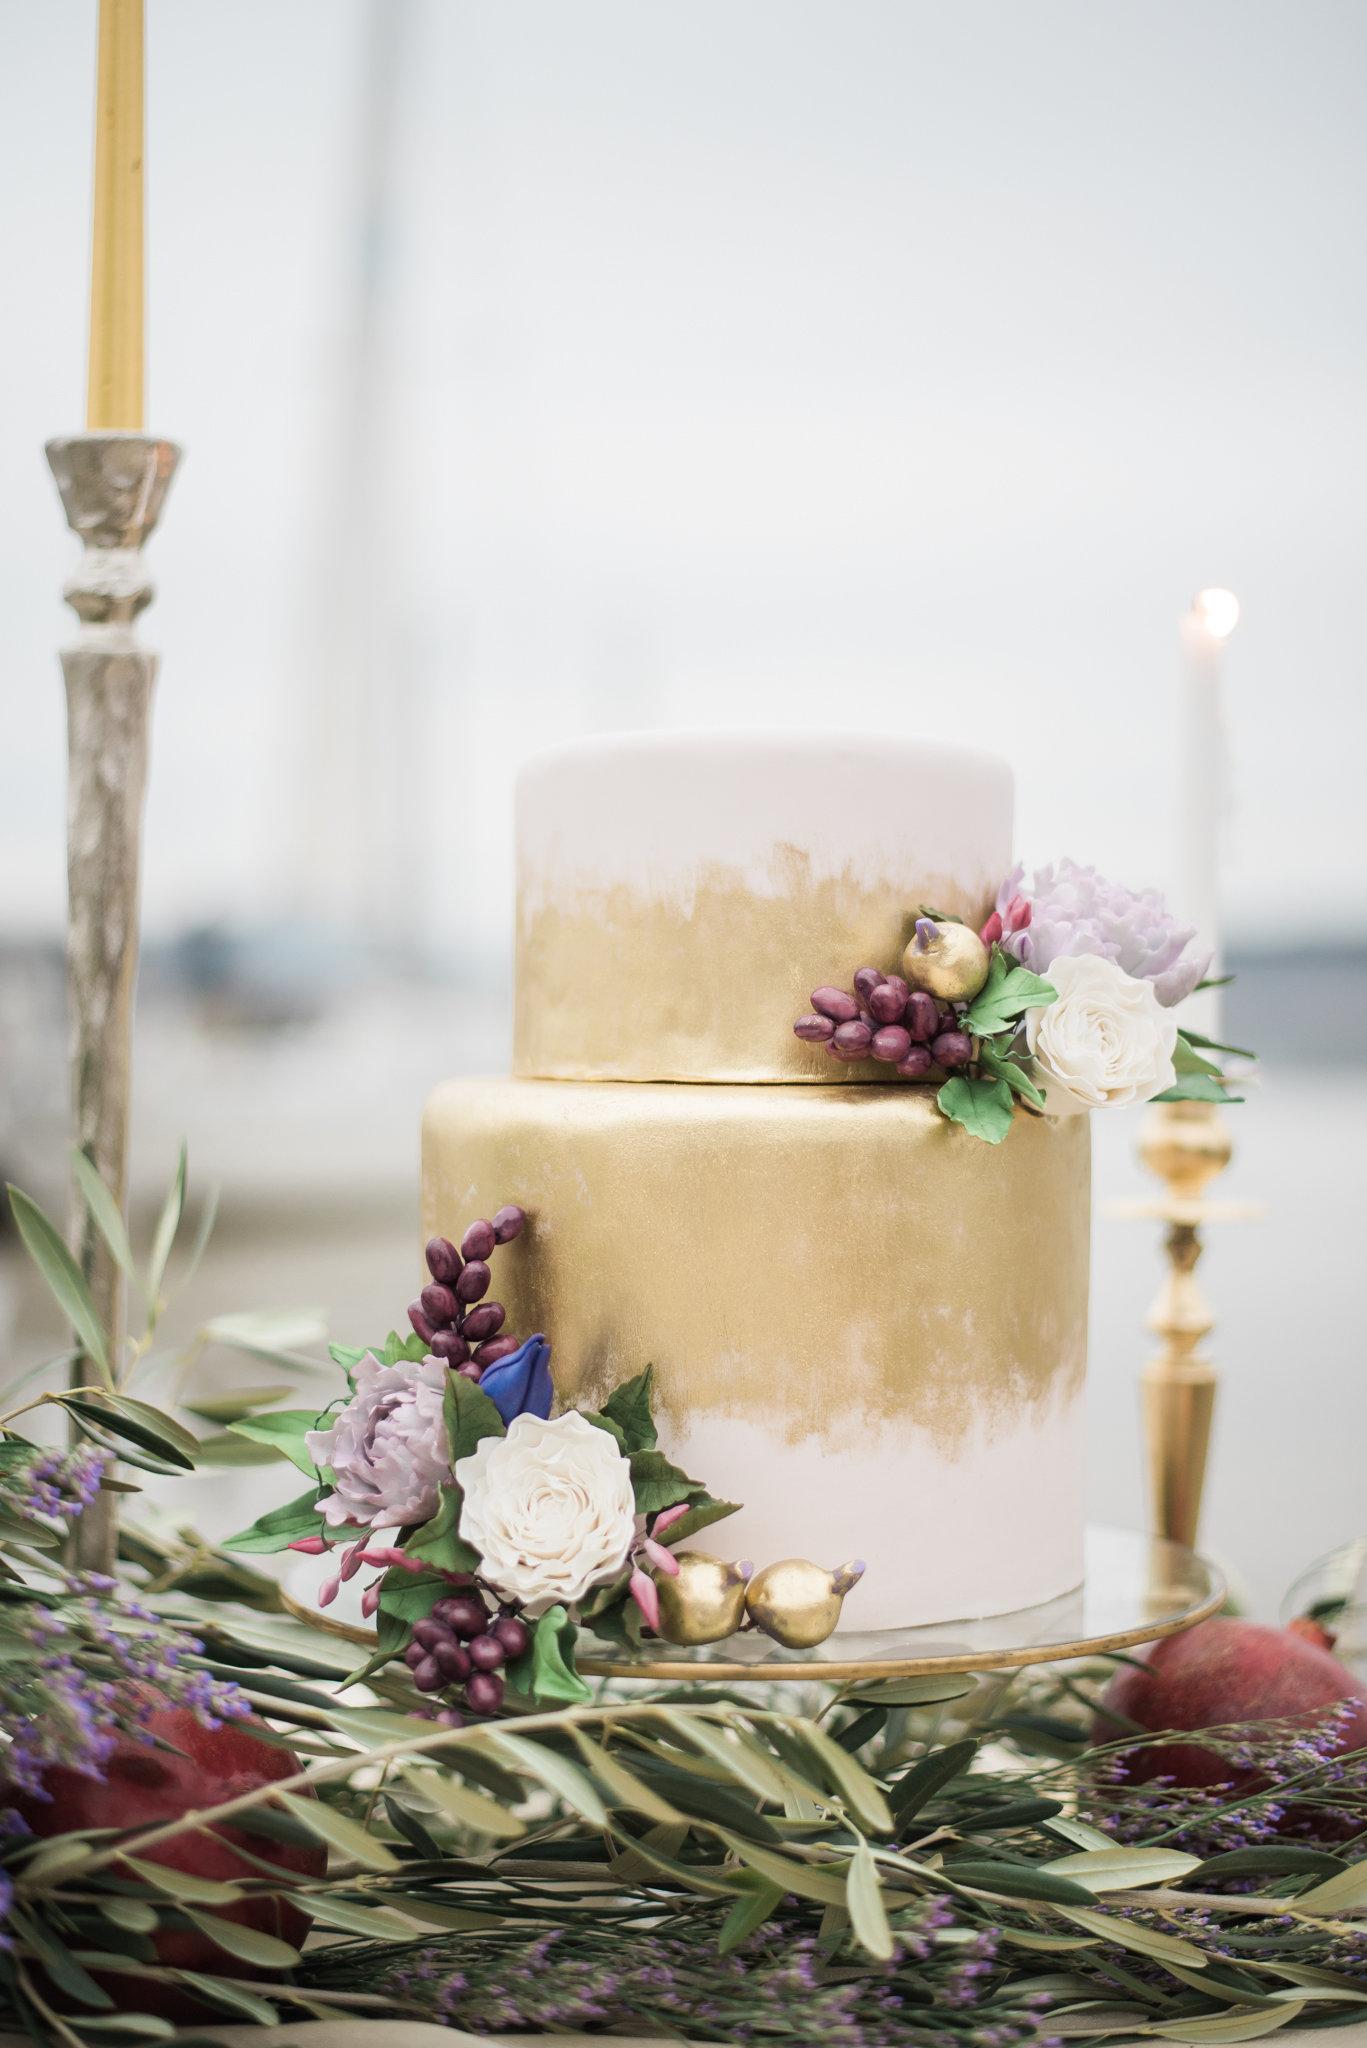 Gia's Cakes | Eric & Jamie Photography | Handley Breaux Designs